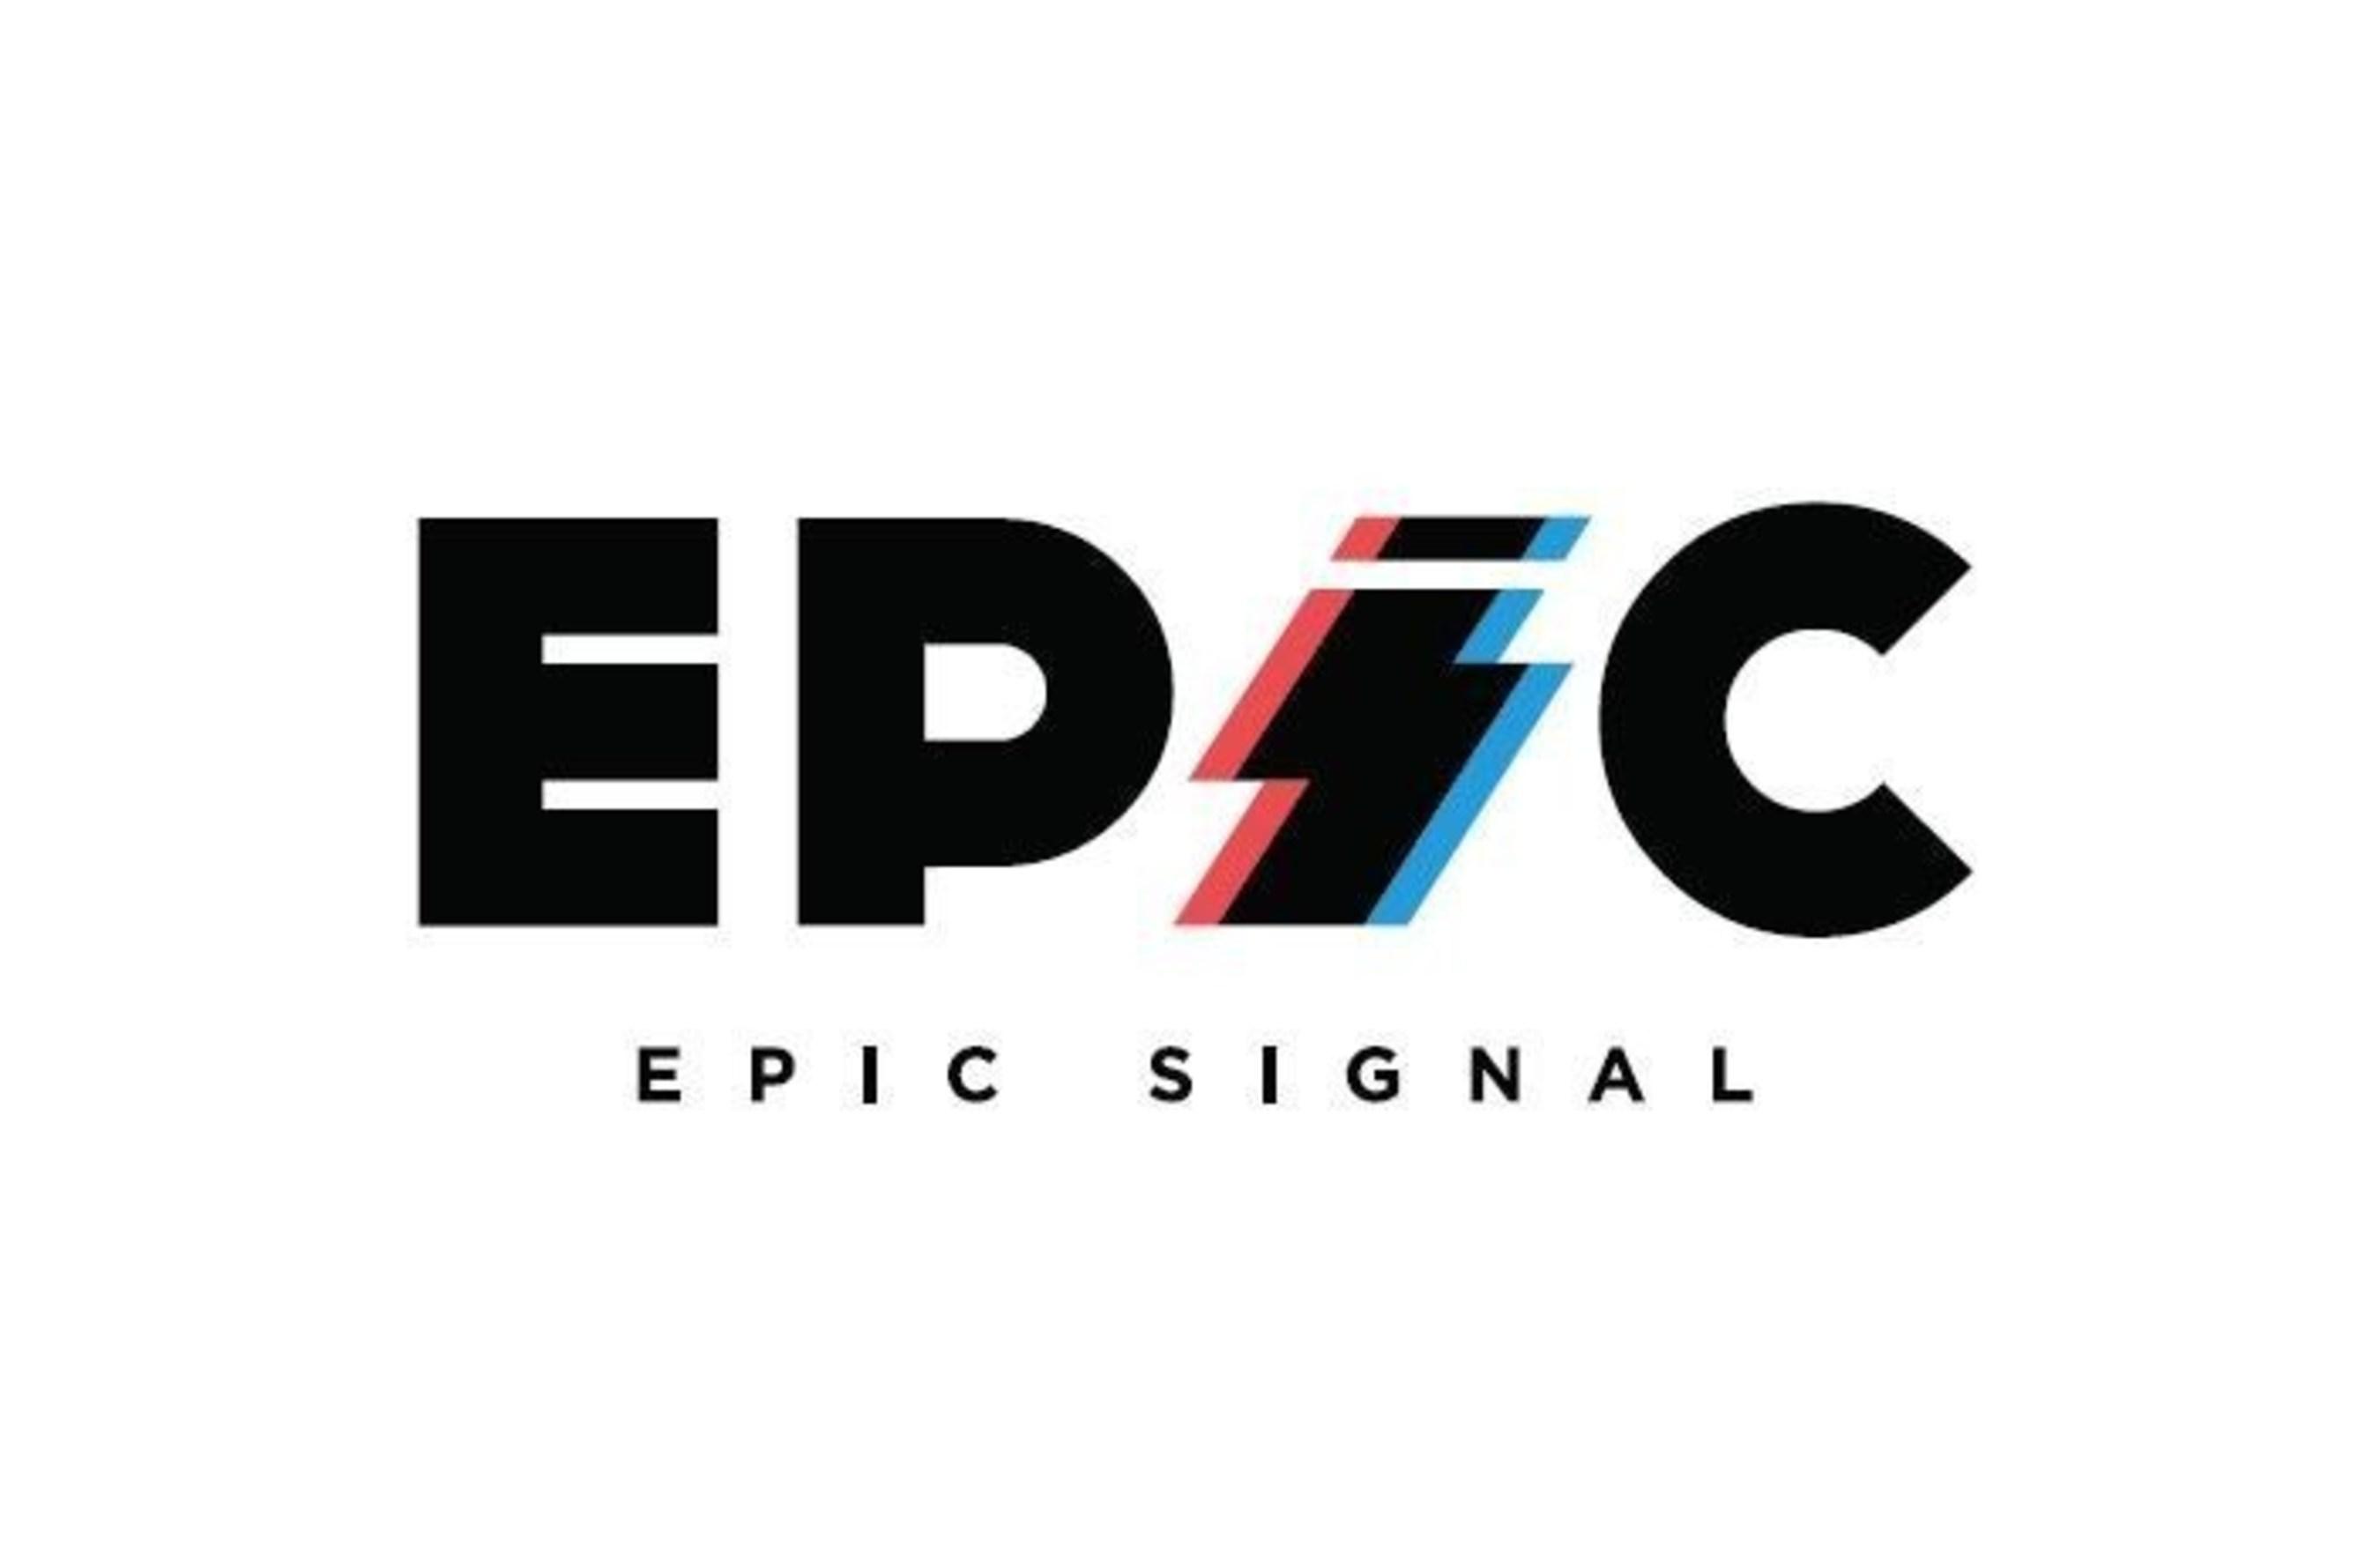 Epic Signal logo